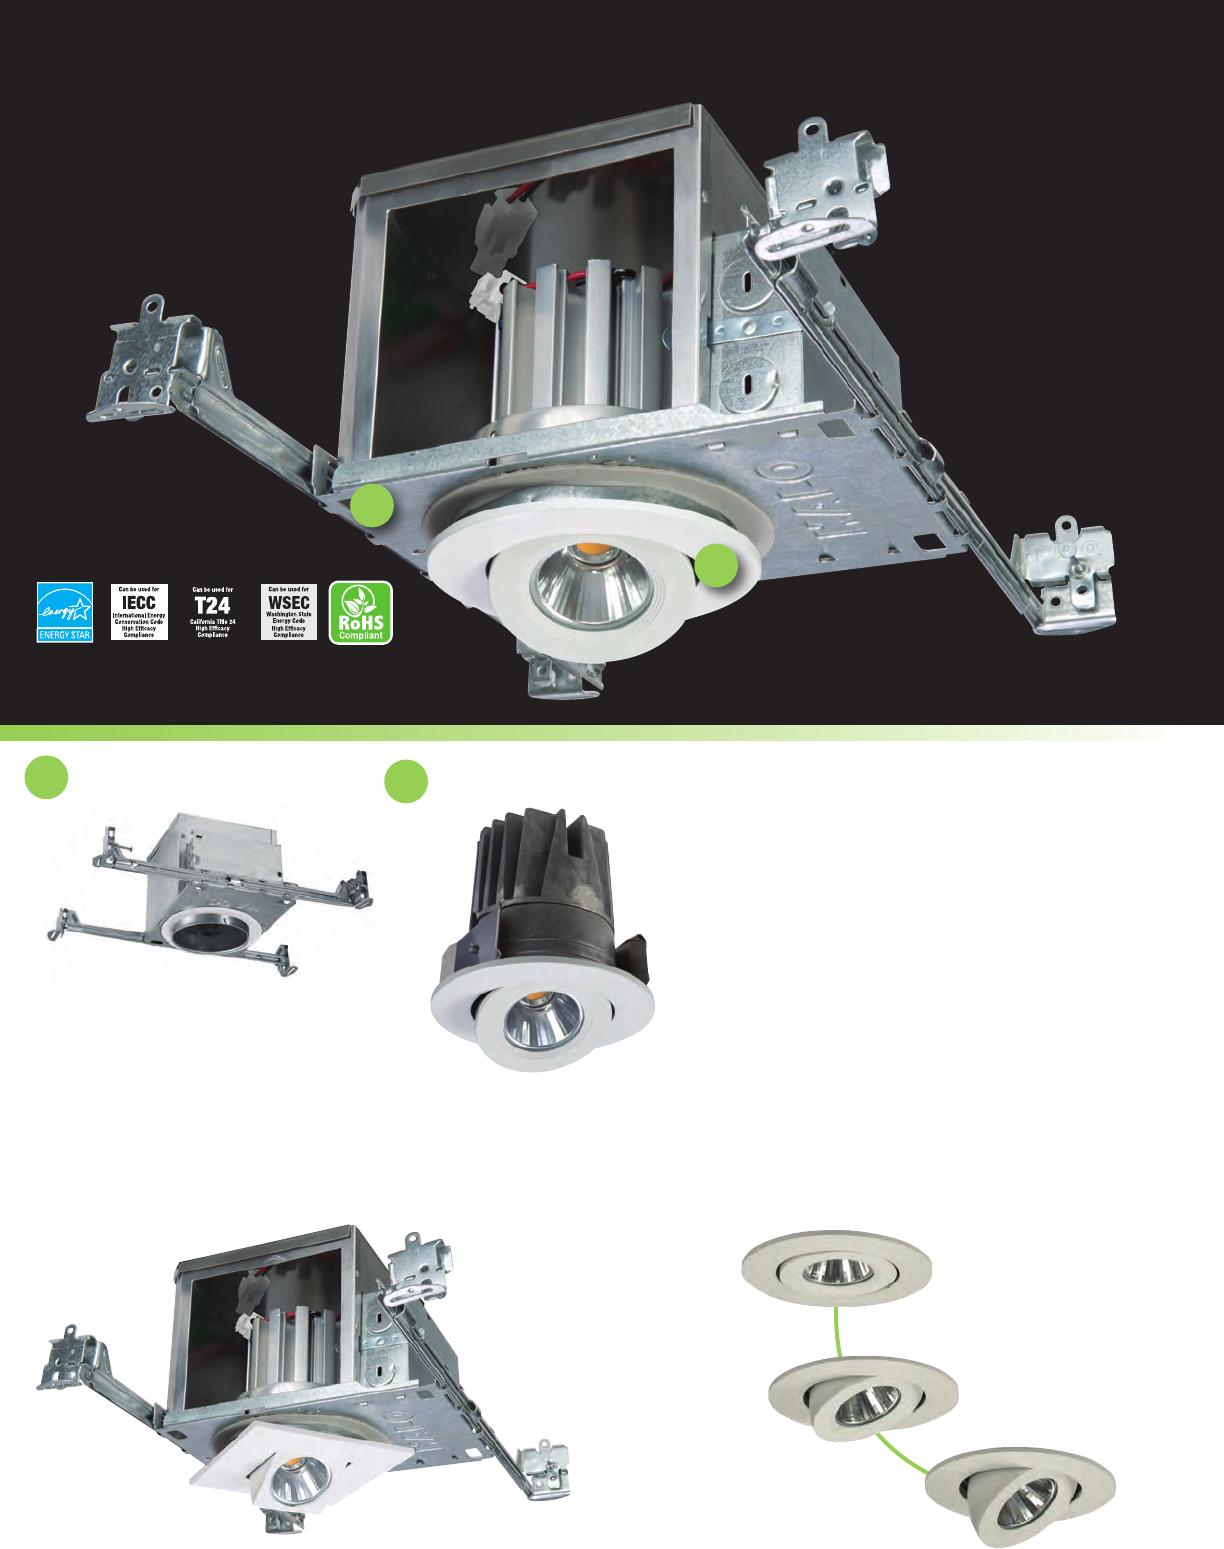 HALO Recessed HALO Recessed EL406935 4-Inch 3500K LED Light Engine EATON